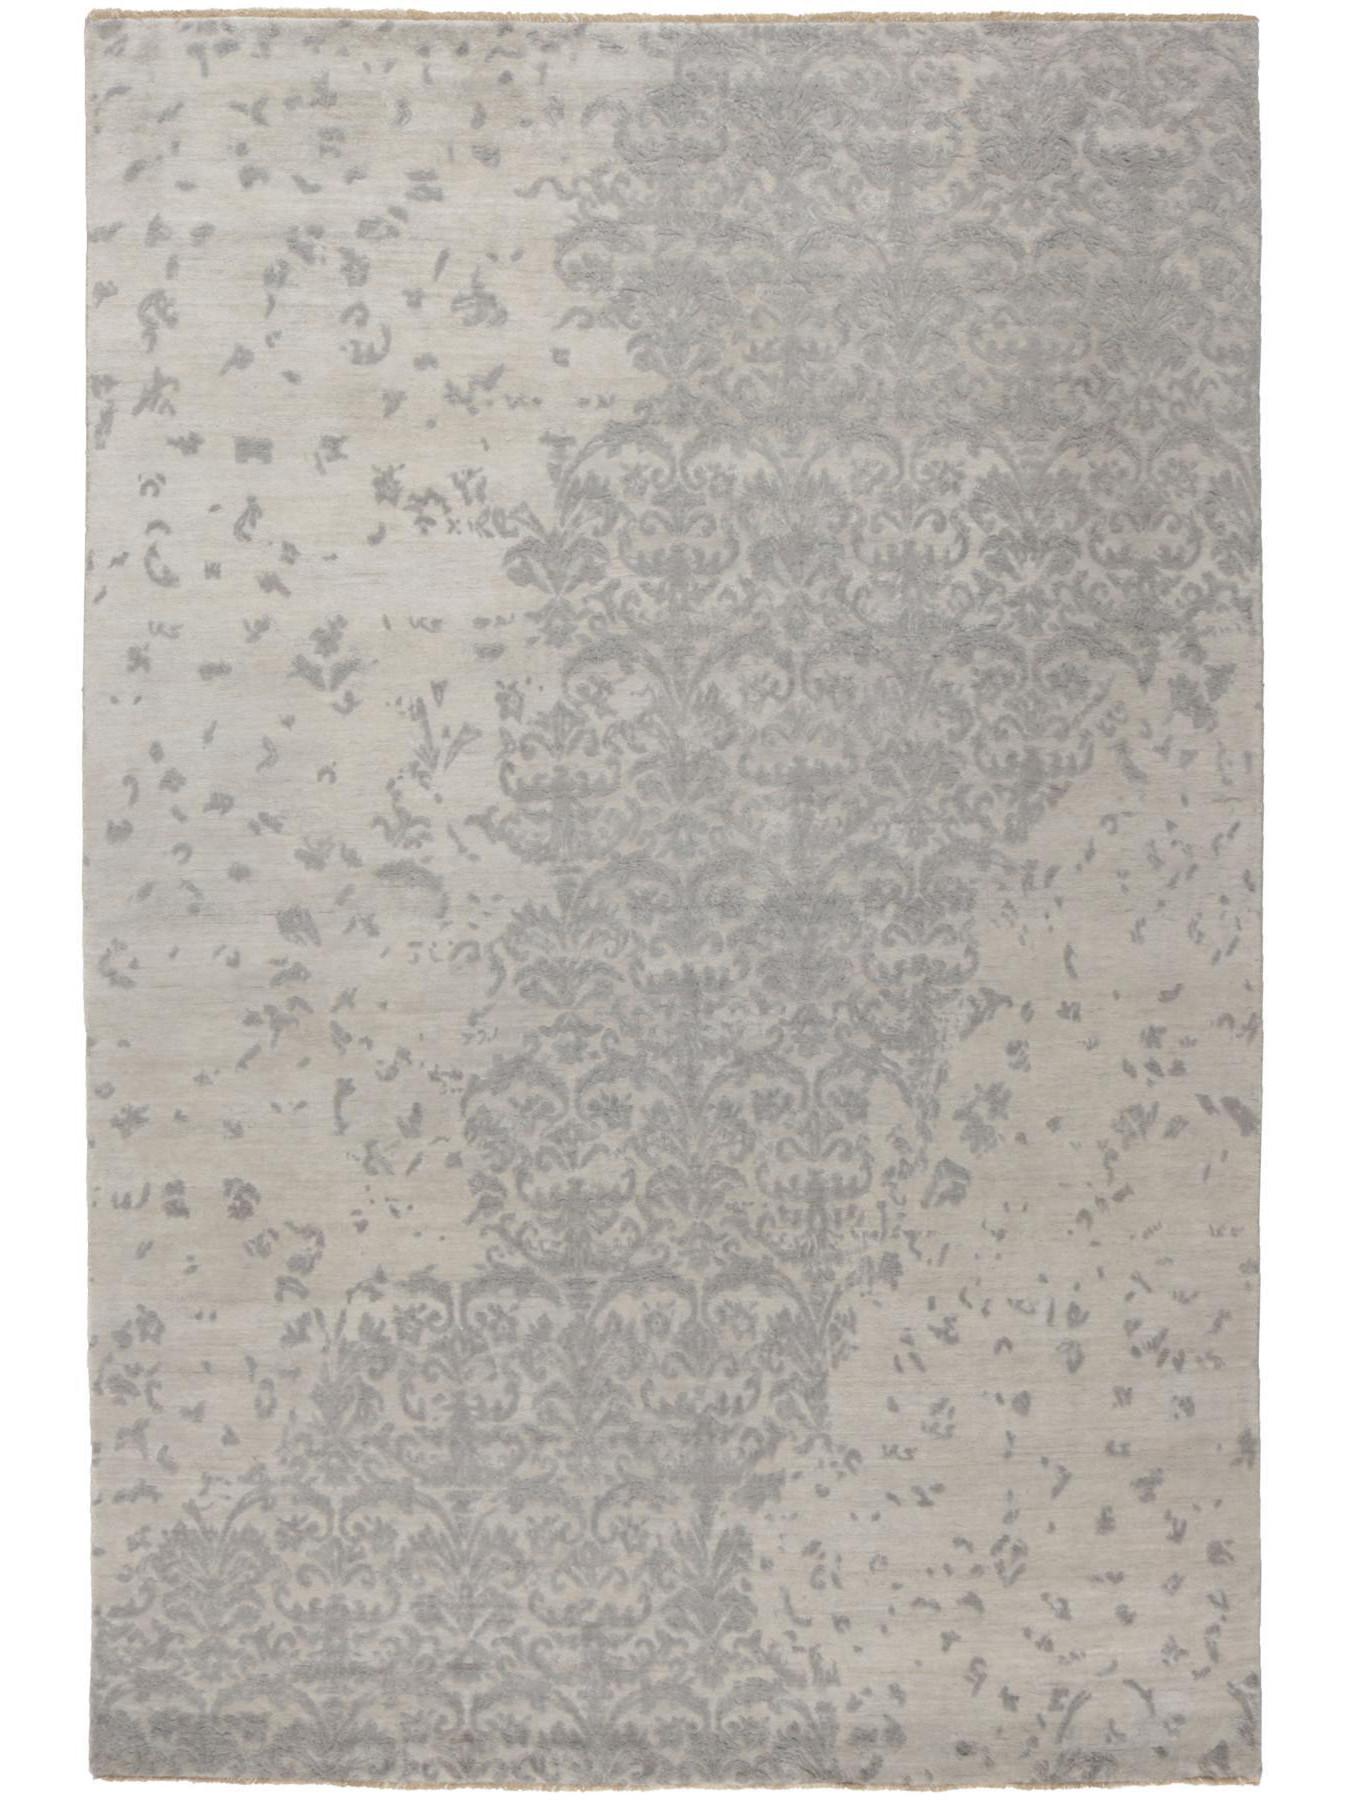 Luxury carpets - Damask-AL-2E B-14/B-15